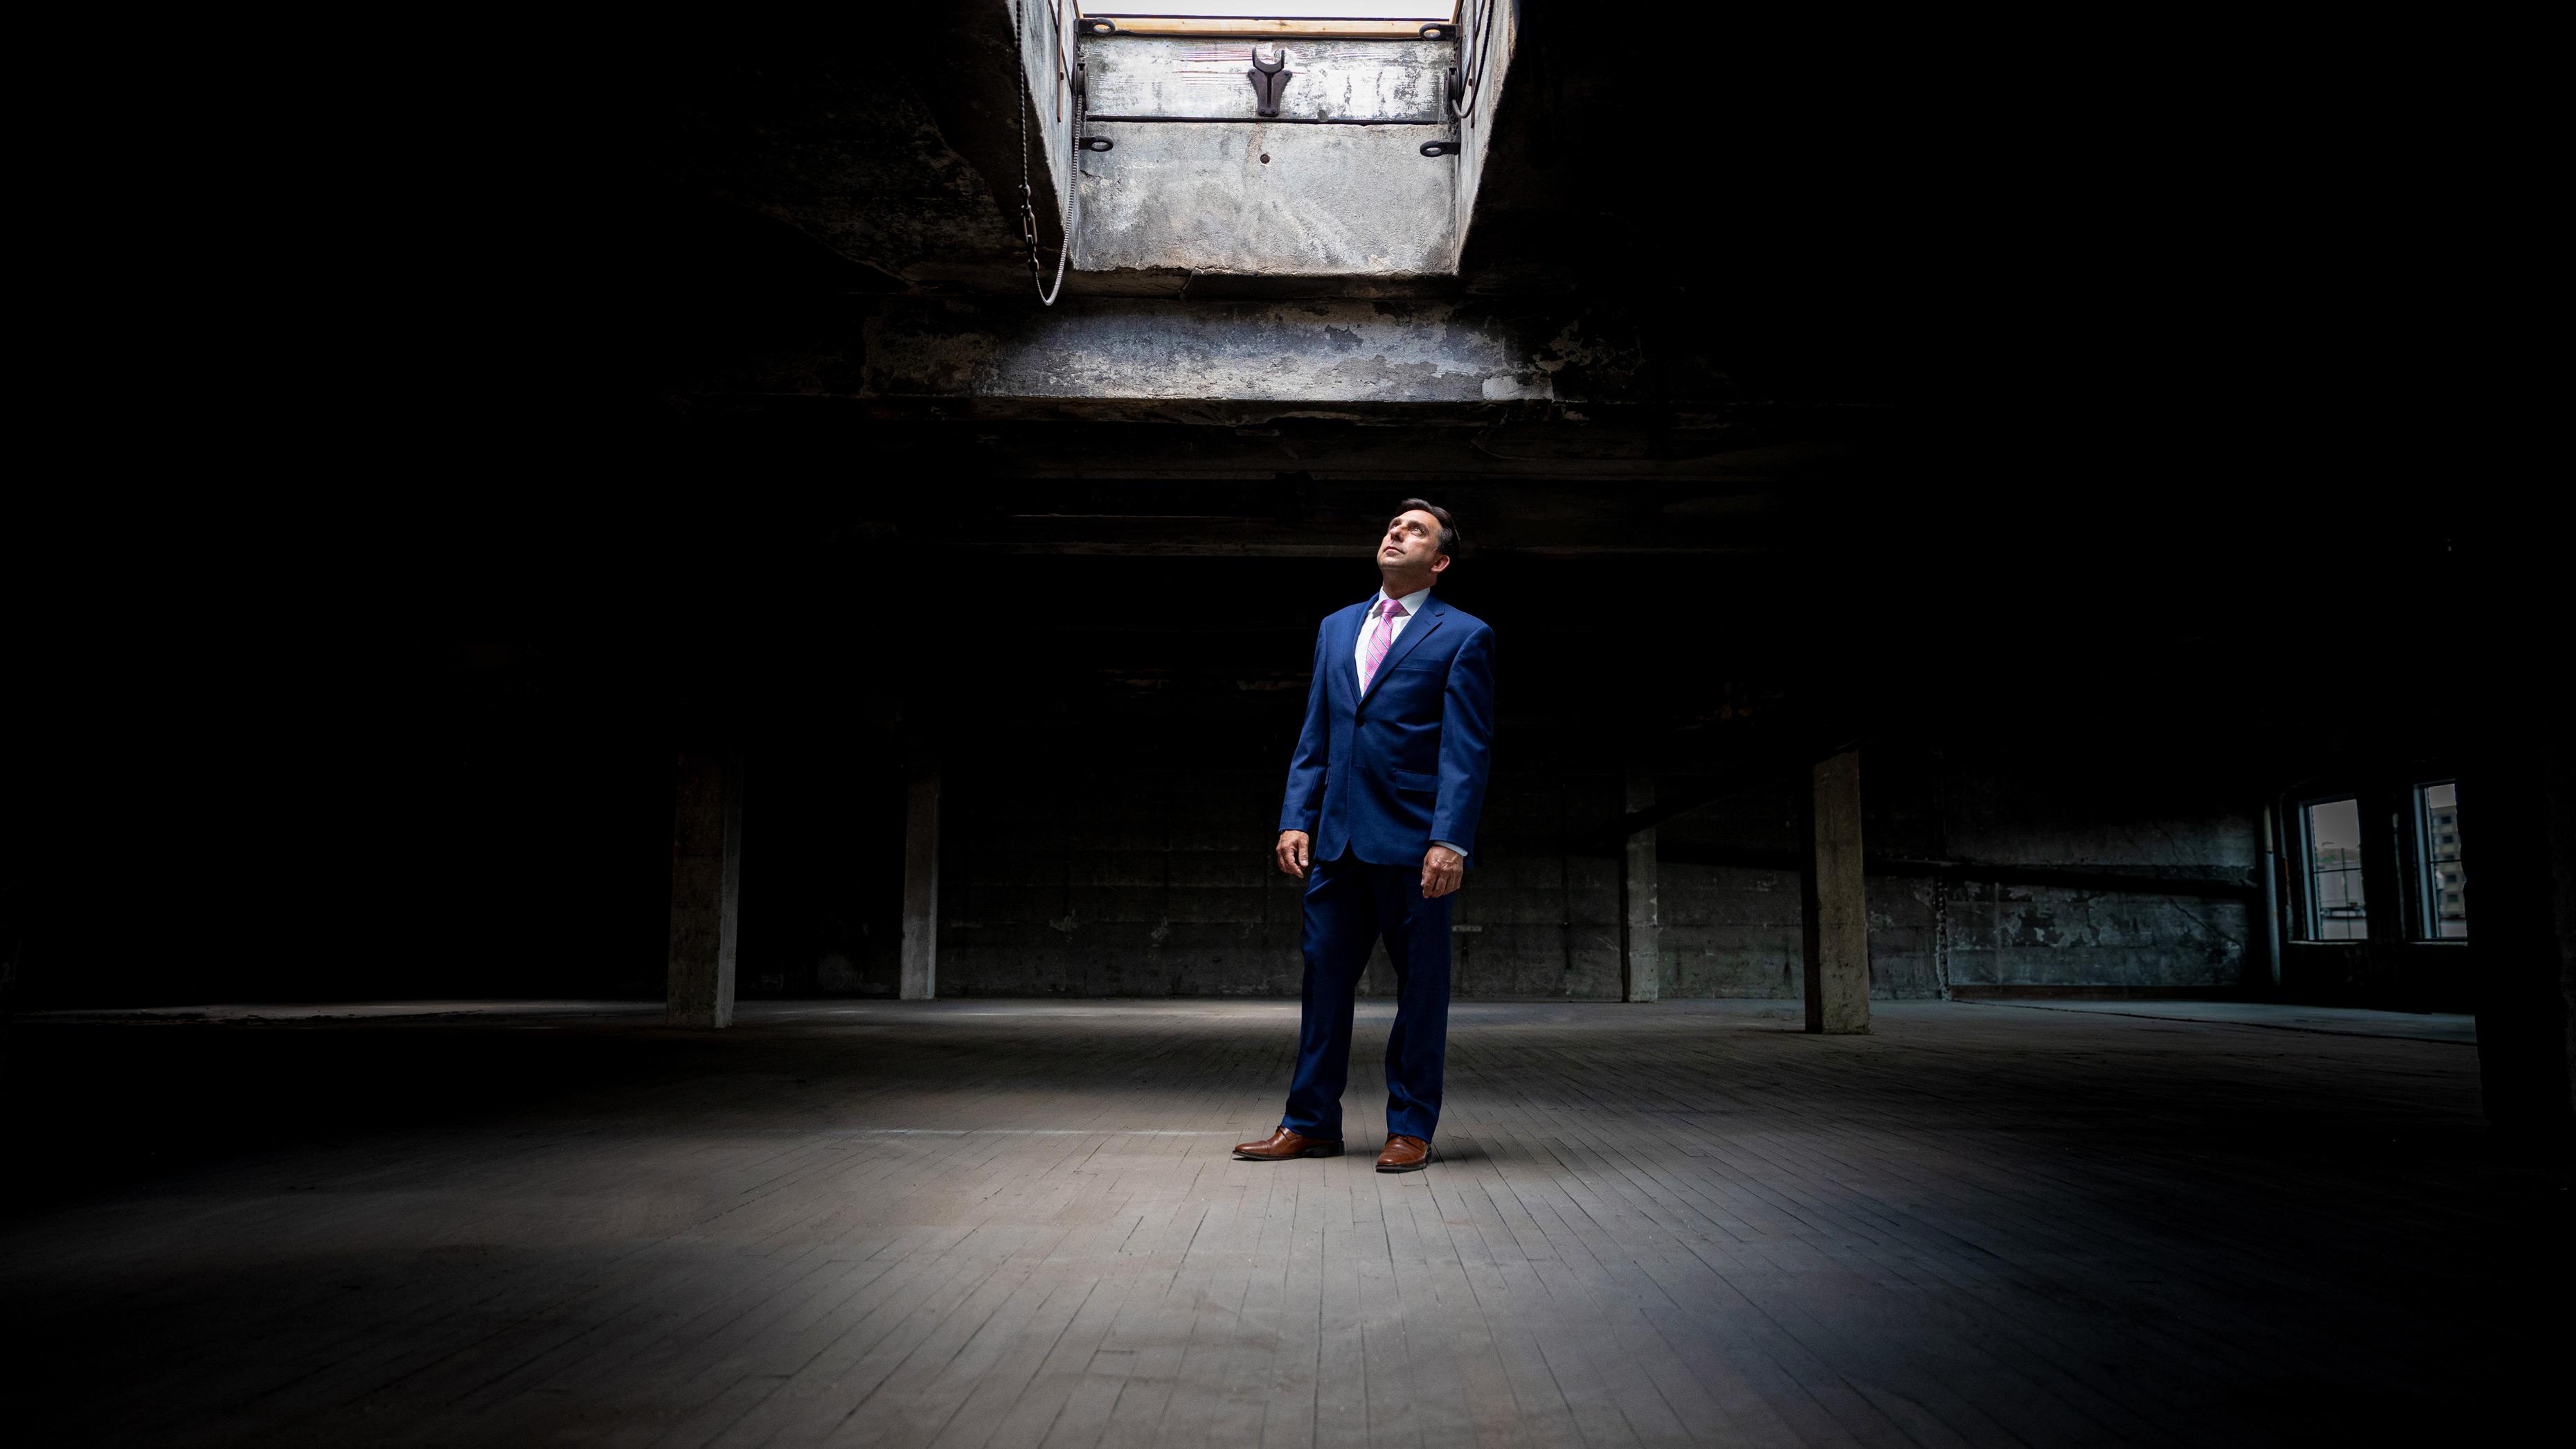 Joe Gramando of Waterbury CT standing under an open skylight in a dark building